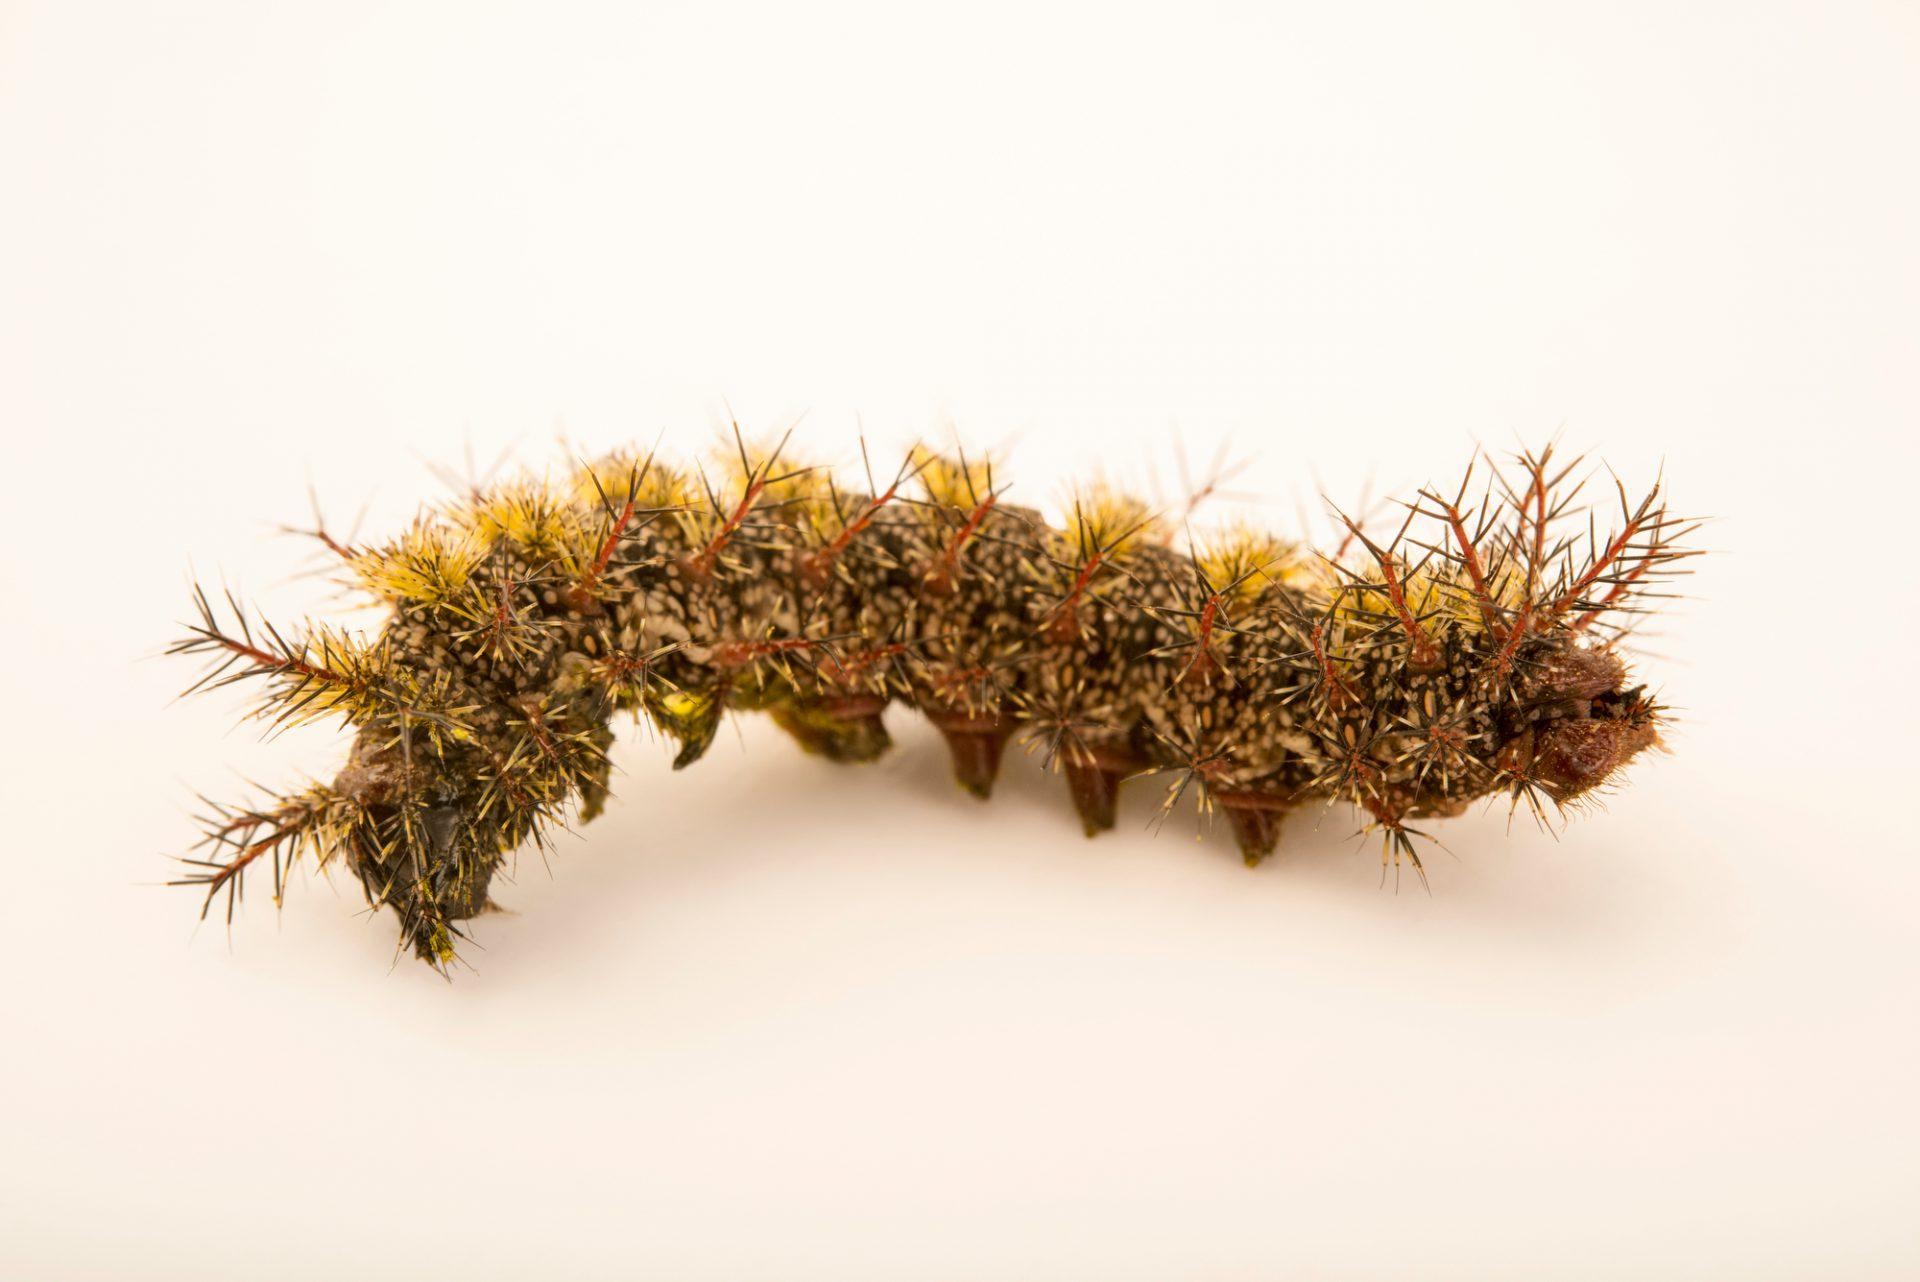 Photo: Buck moth caterpillar (Hemileuca maia) at the Audubon Insectarium.